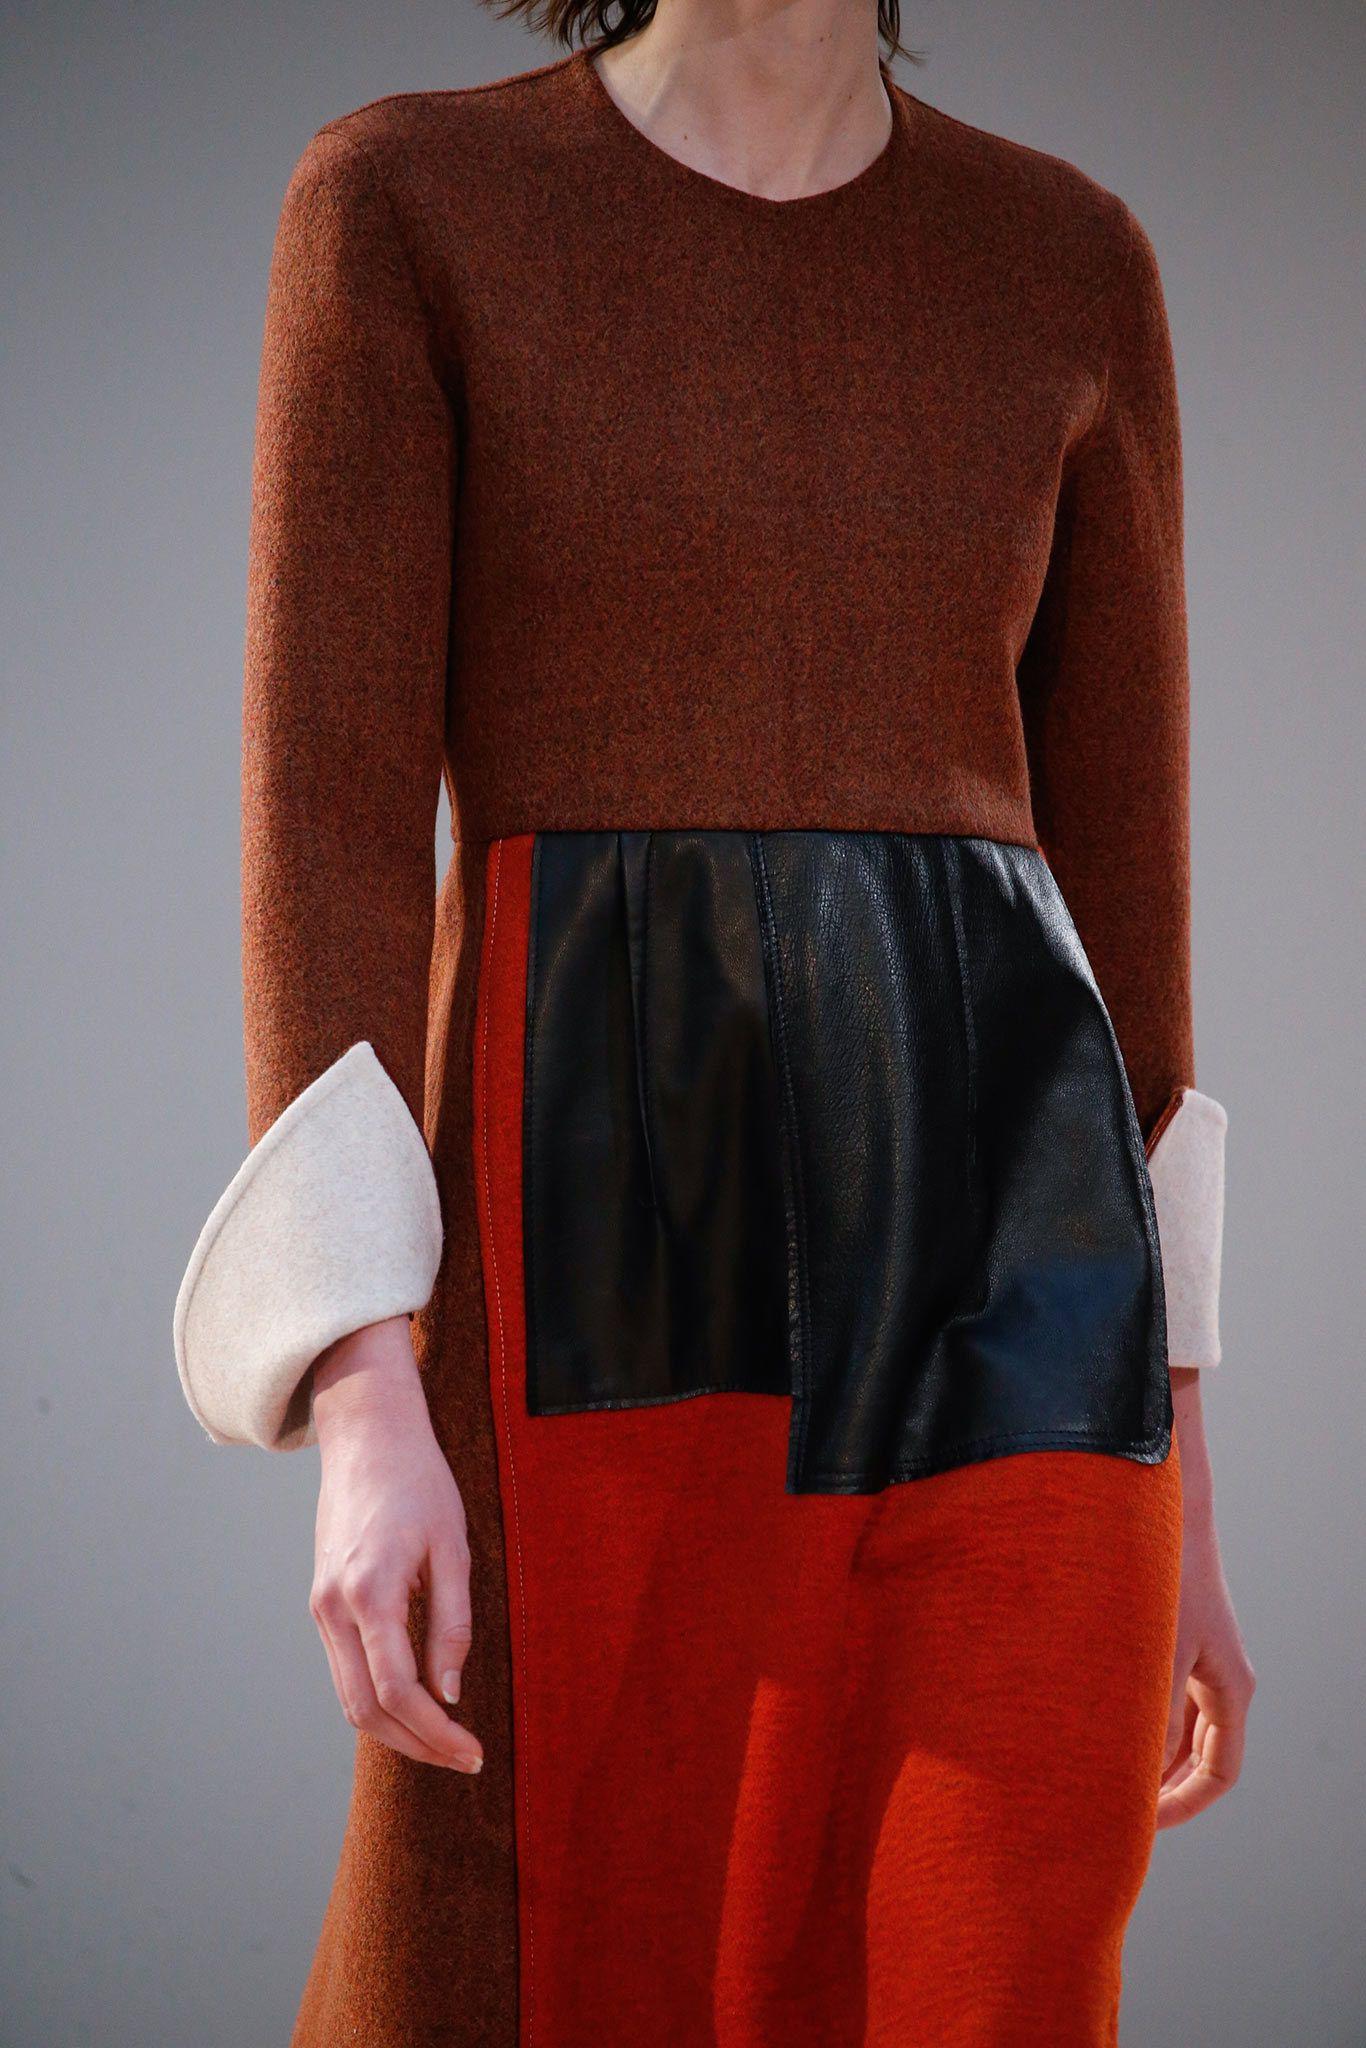 Céline Fall 2015 Ready-to-Wear Fashion Show Details